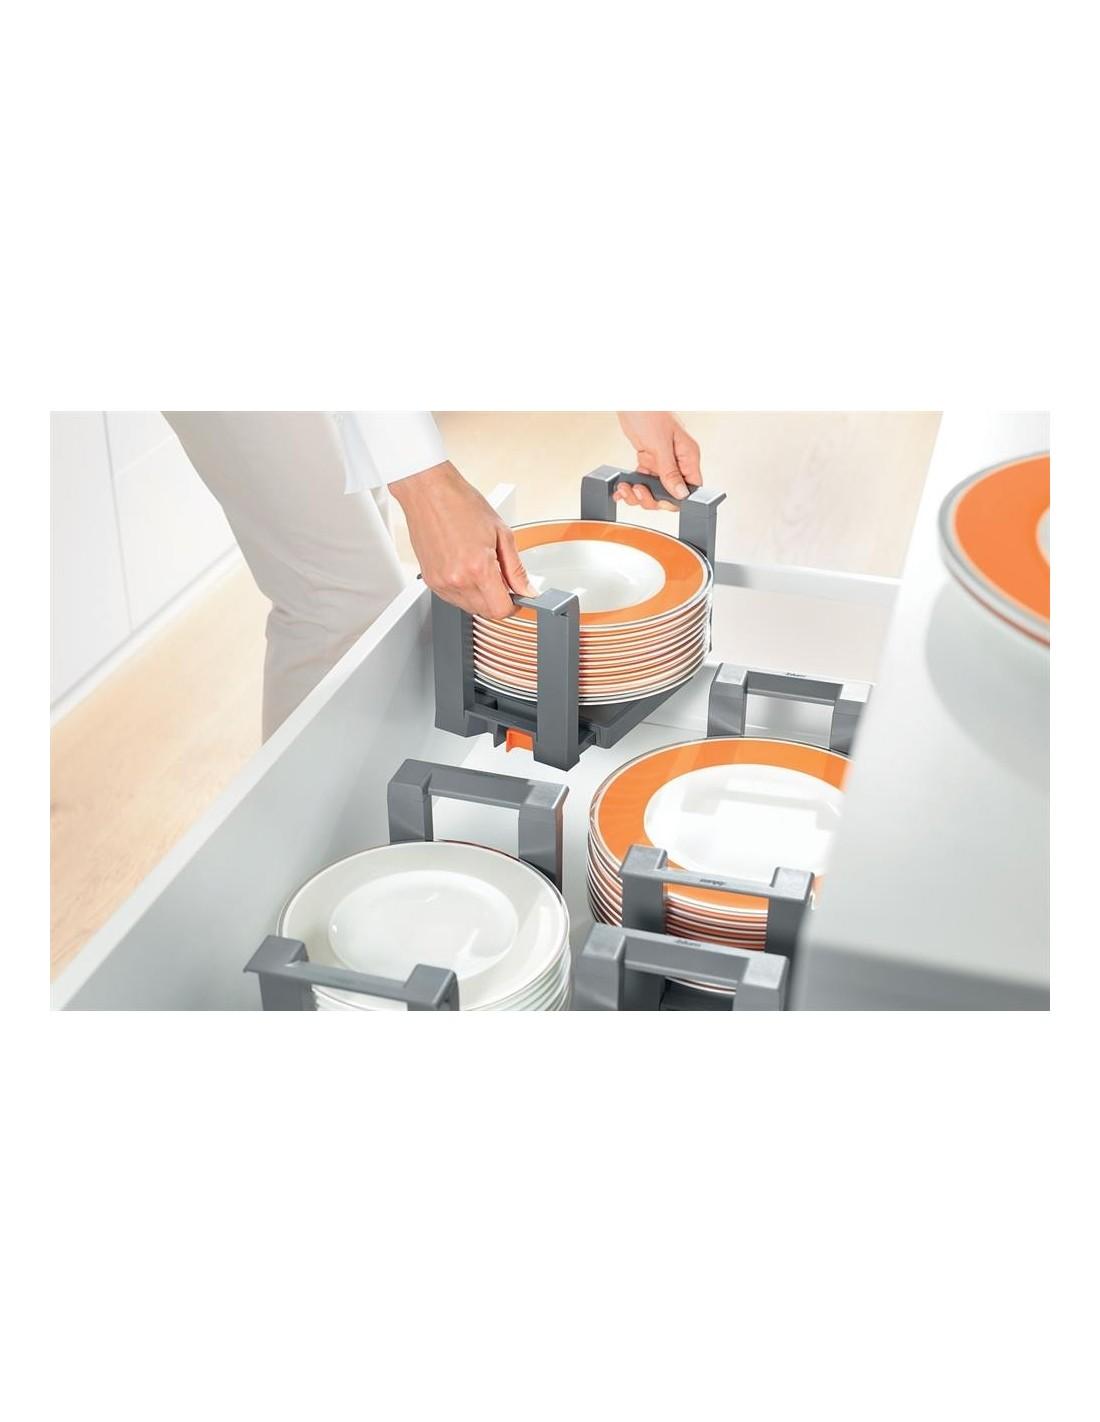 ... Blum Plate Holder Ambia-Orga-Line 12 Plates 186-322mm Dia  sc 1 st  East Coast Kitchens & Blum Ambia \u0026 Orga-line Plate Rack Holder ZC7T0350 £59.99